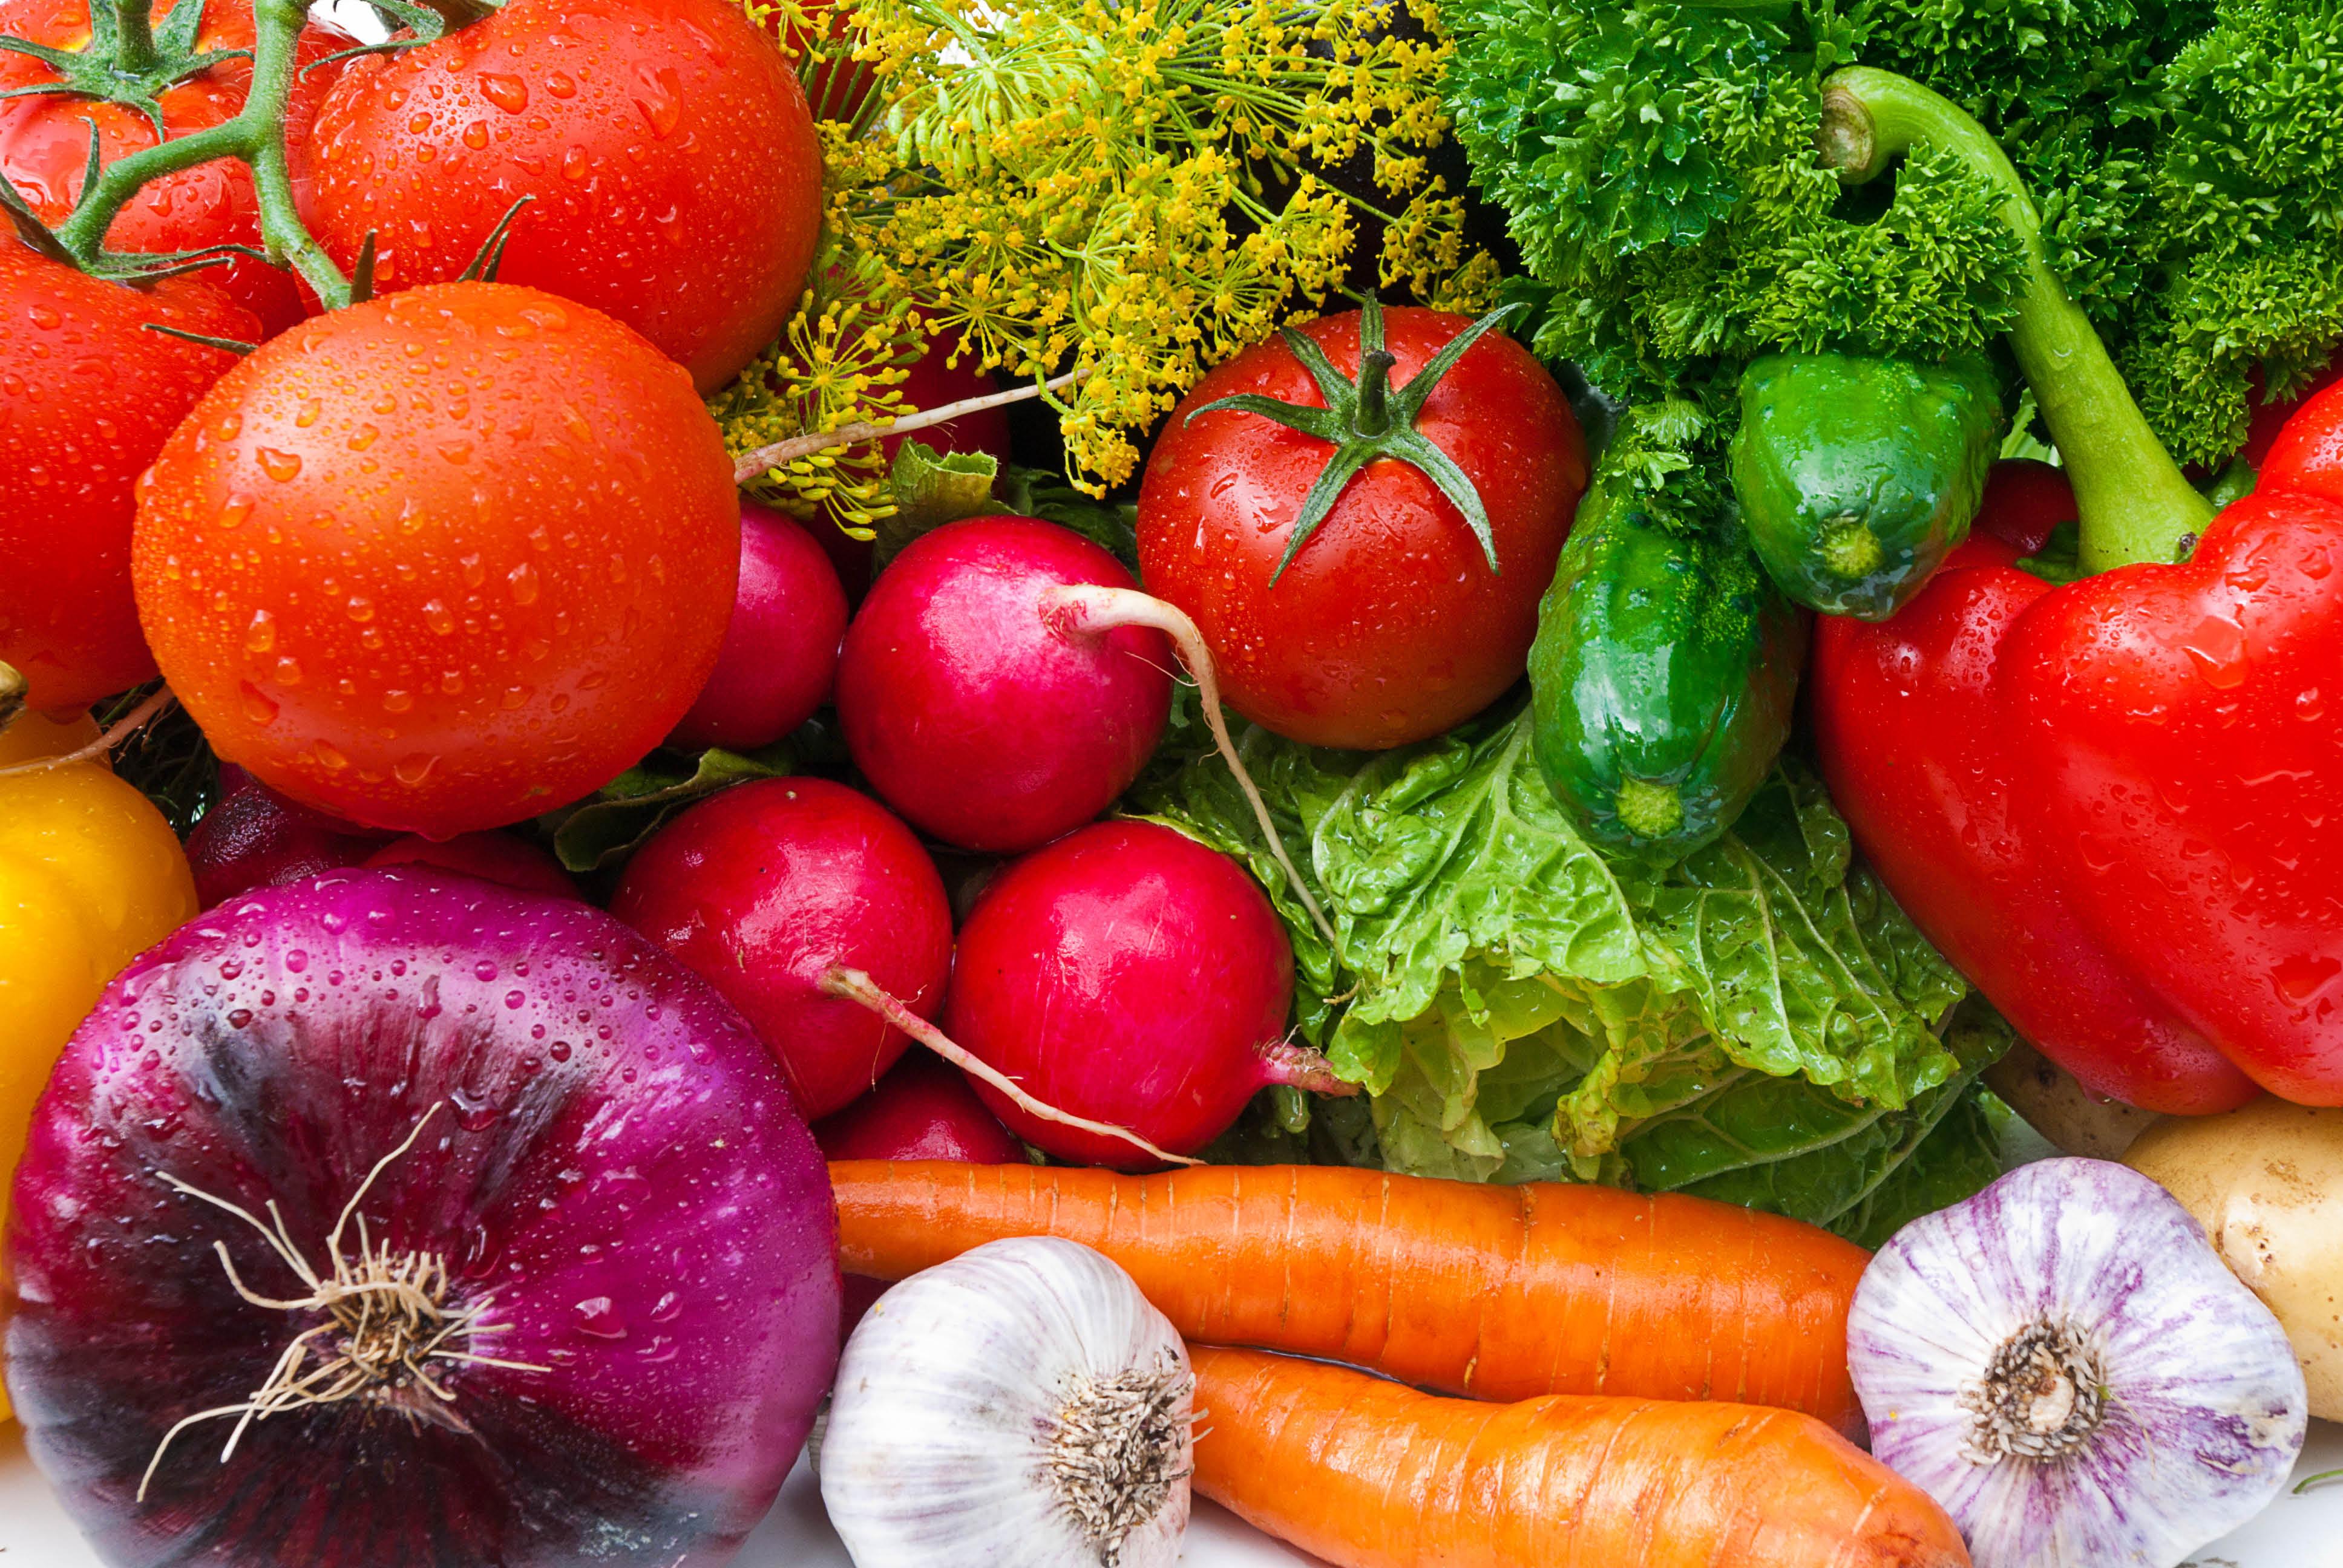 organic food non GMO no GMO vegan vegetarian grocery store coupons health food coupons